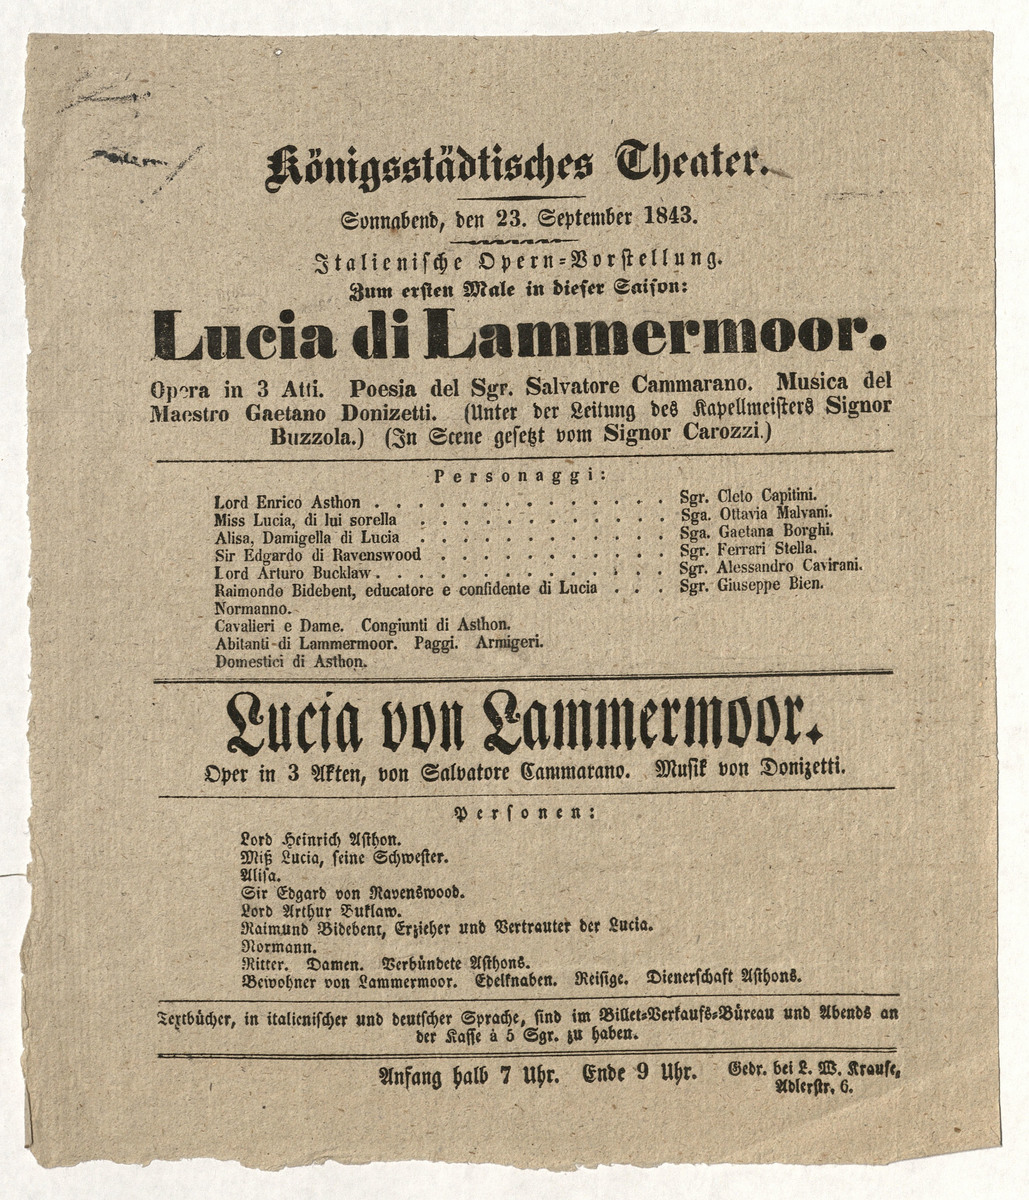 Lucia di Lammermoor opera playbill